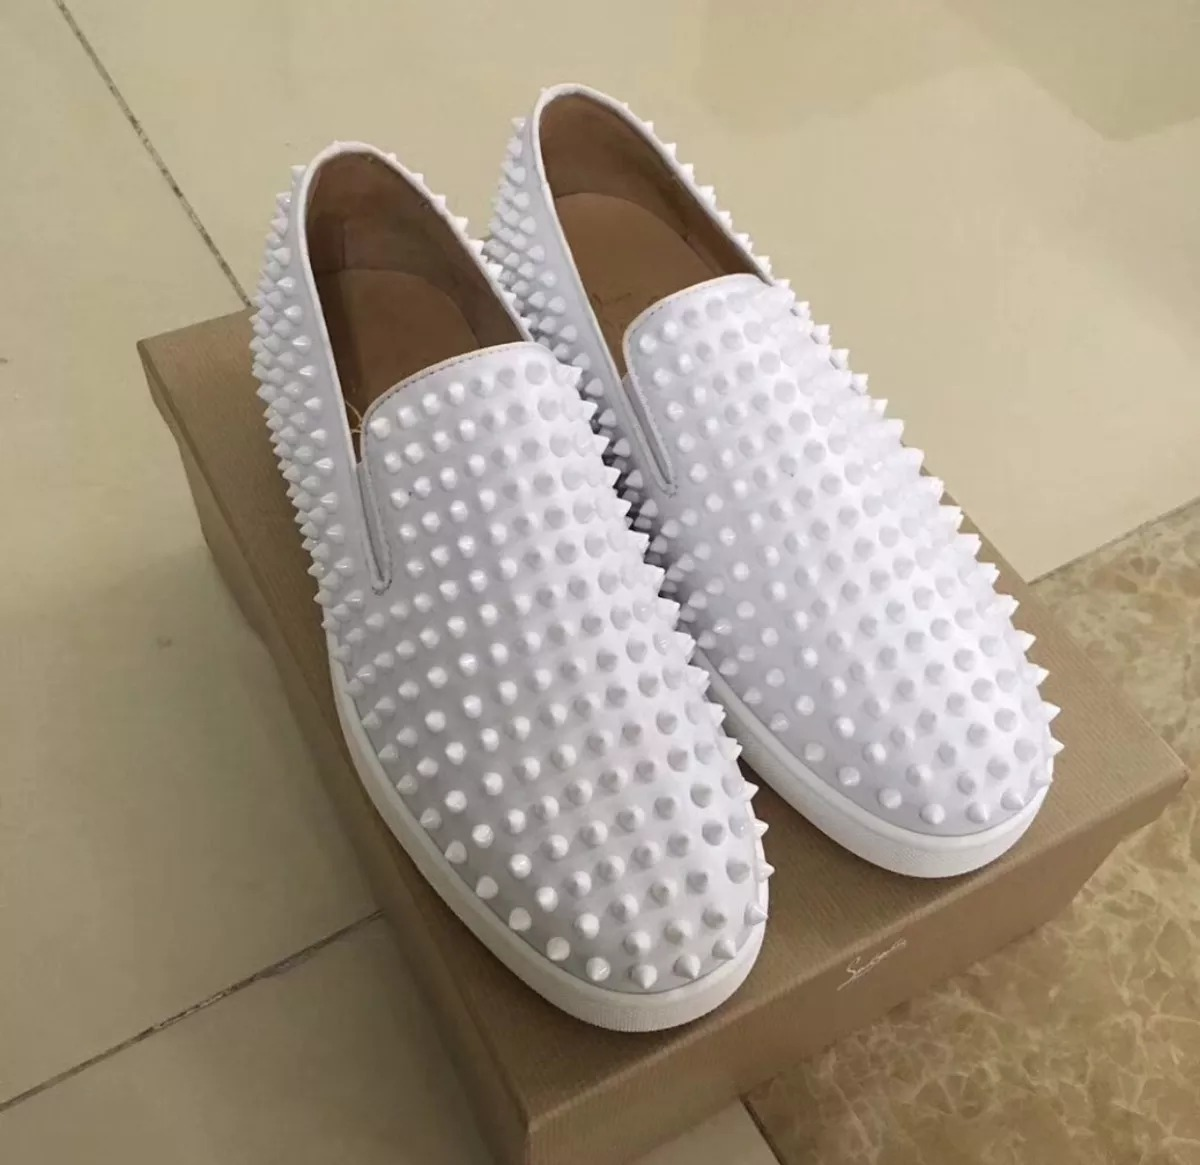 Sapatilha Sapato Louboutin Spikes Branco Couro (35 - 42) - R  1.099 ... 36c0665134